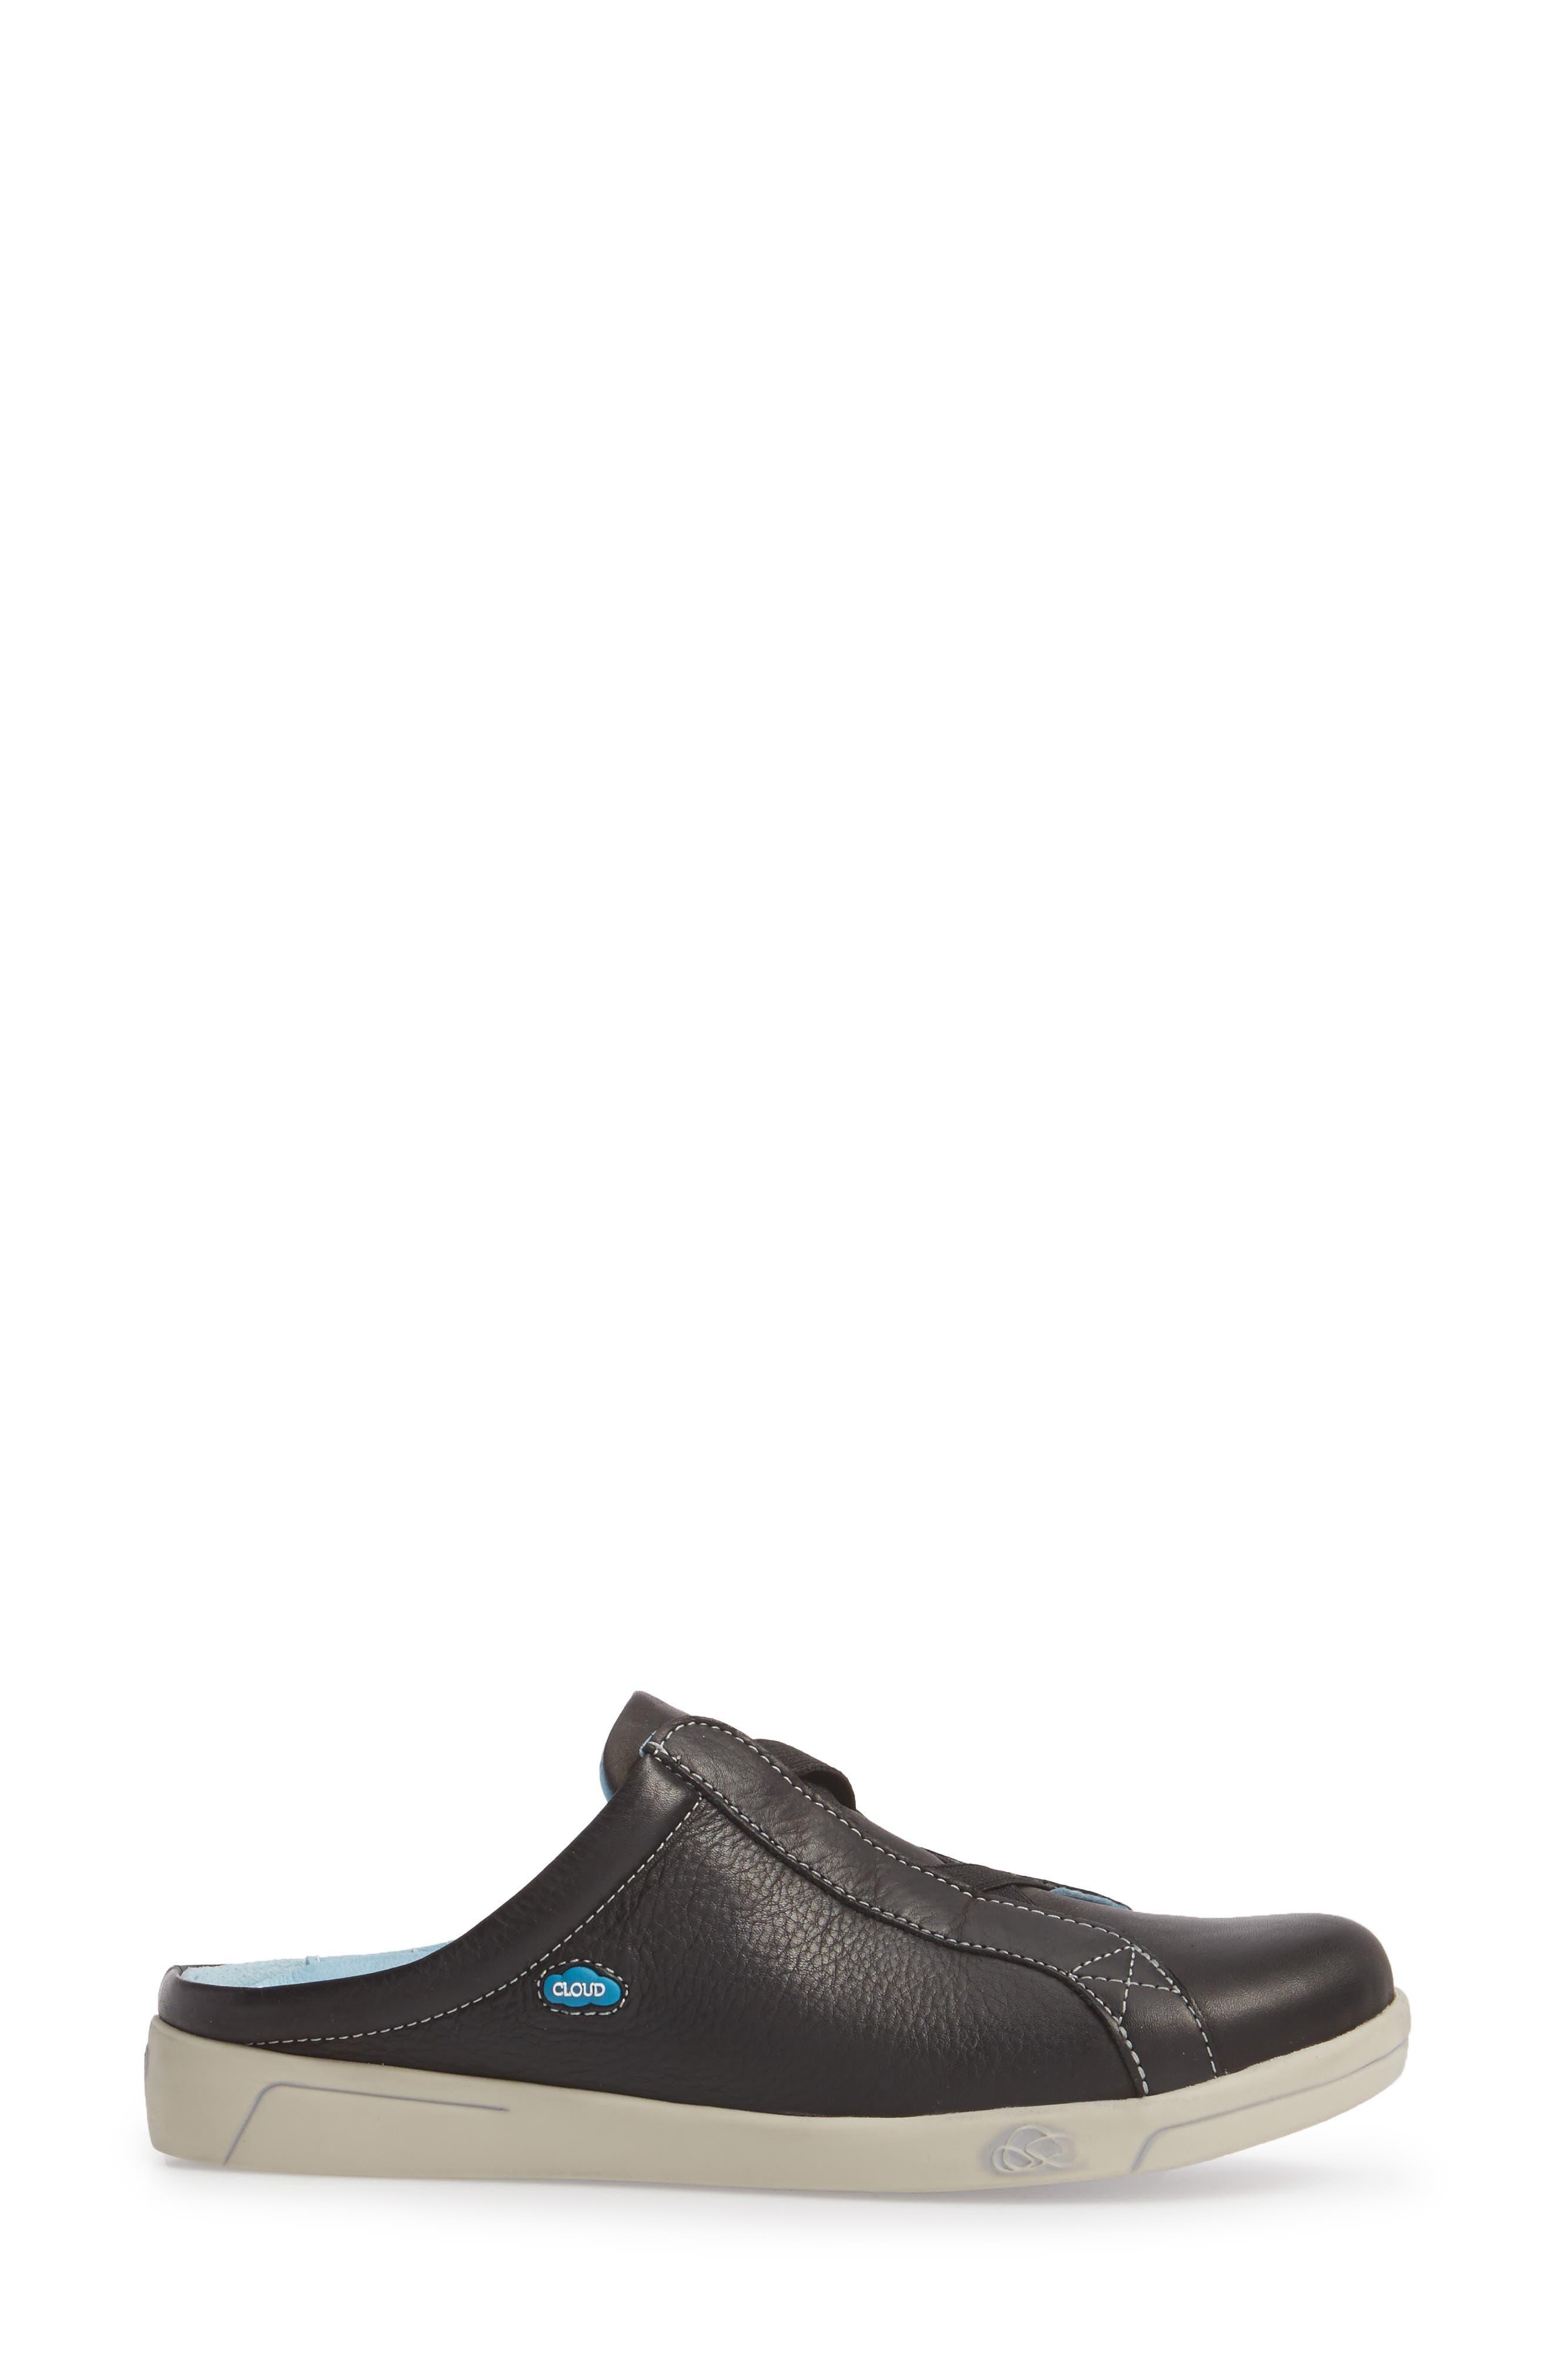 Arizona Sneaker,                             Alternate thumbnail 3, color,                             BLACK LEATHER